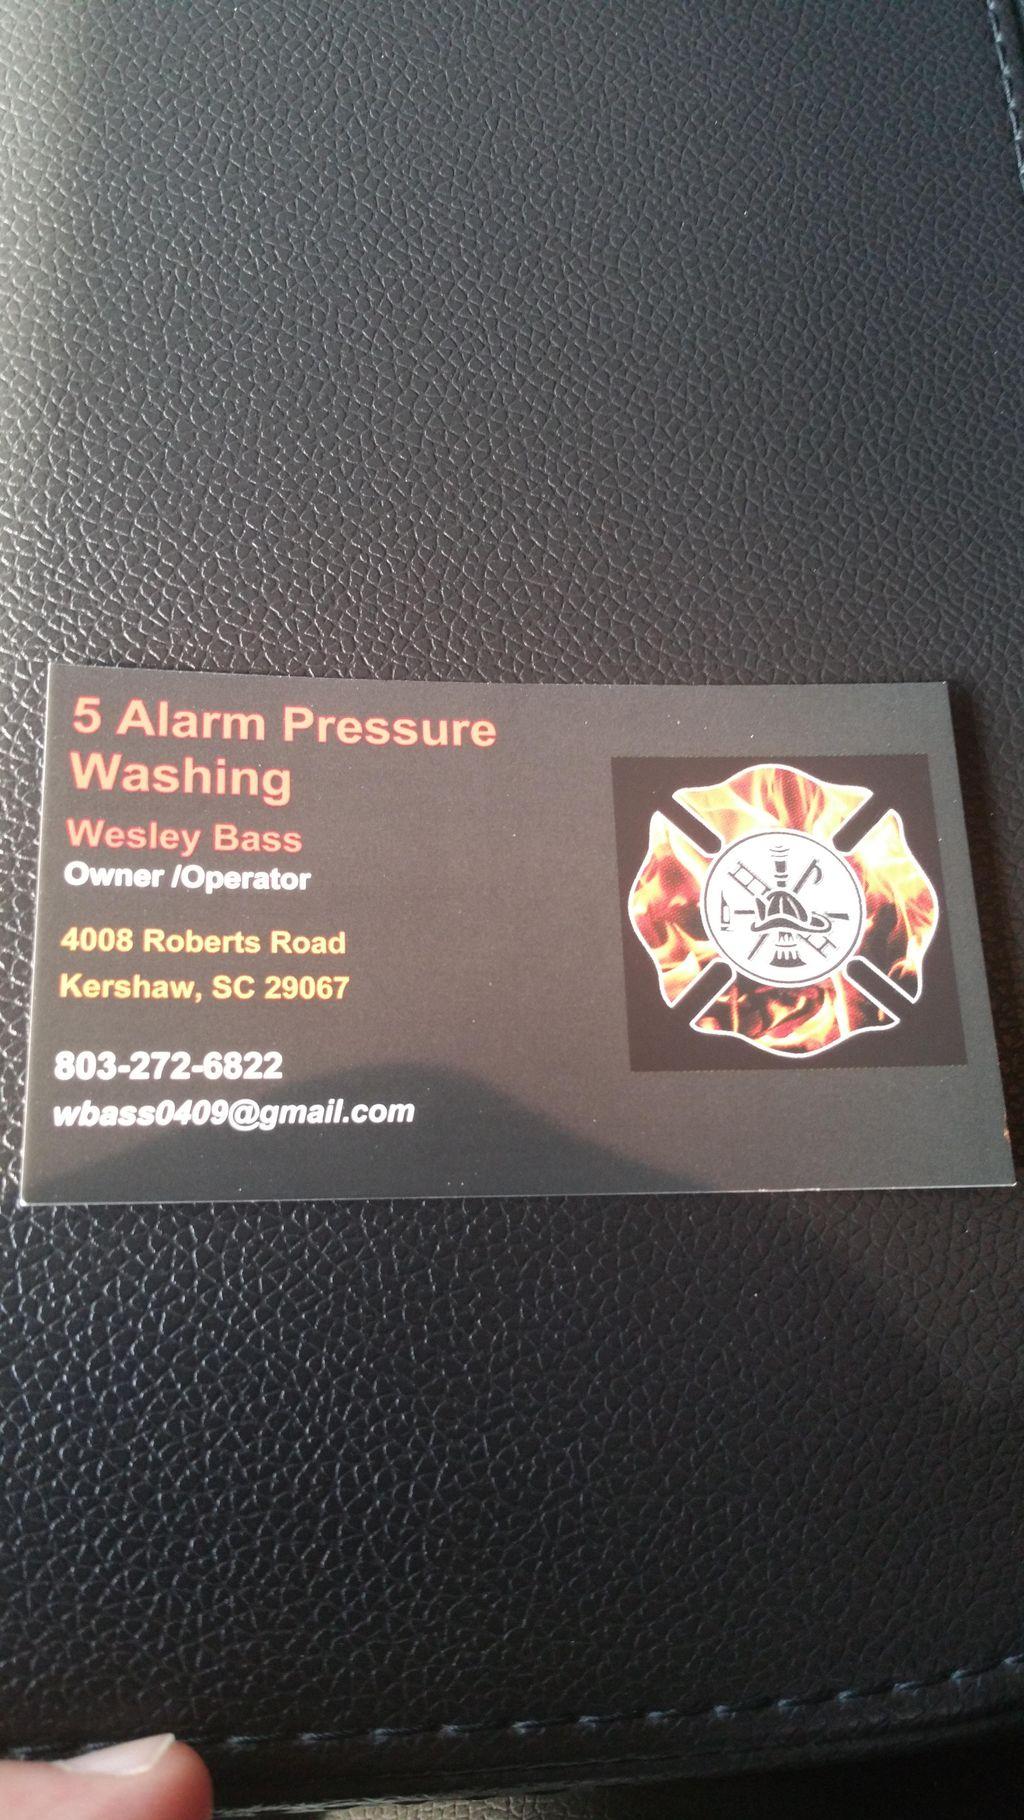 5 alarm pressure washing